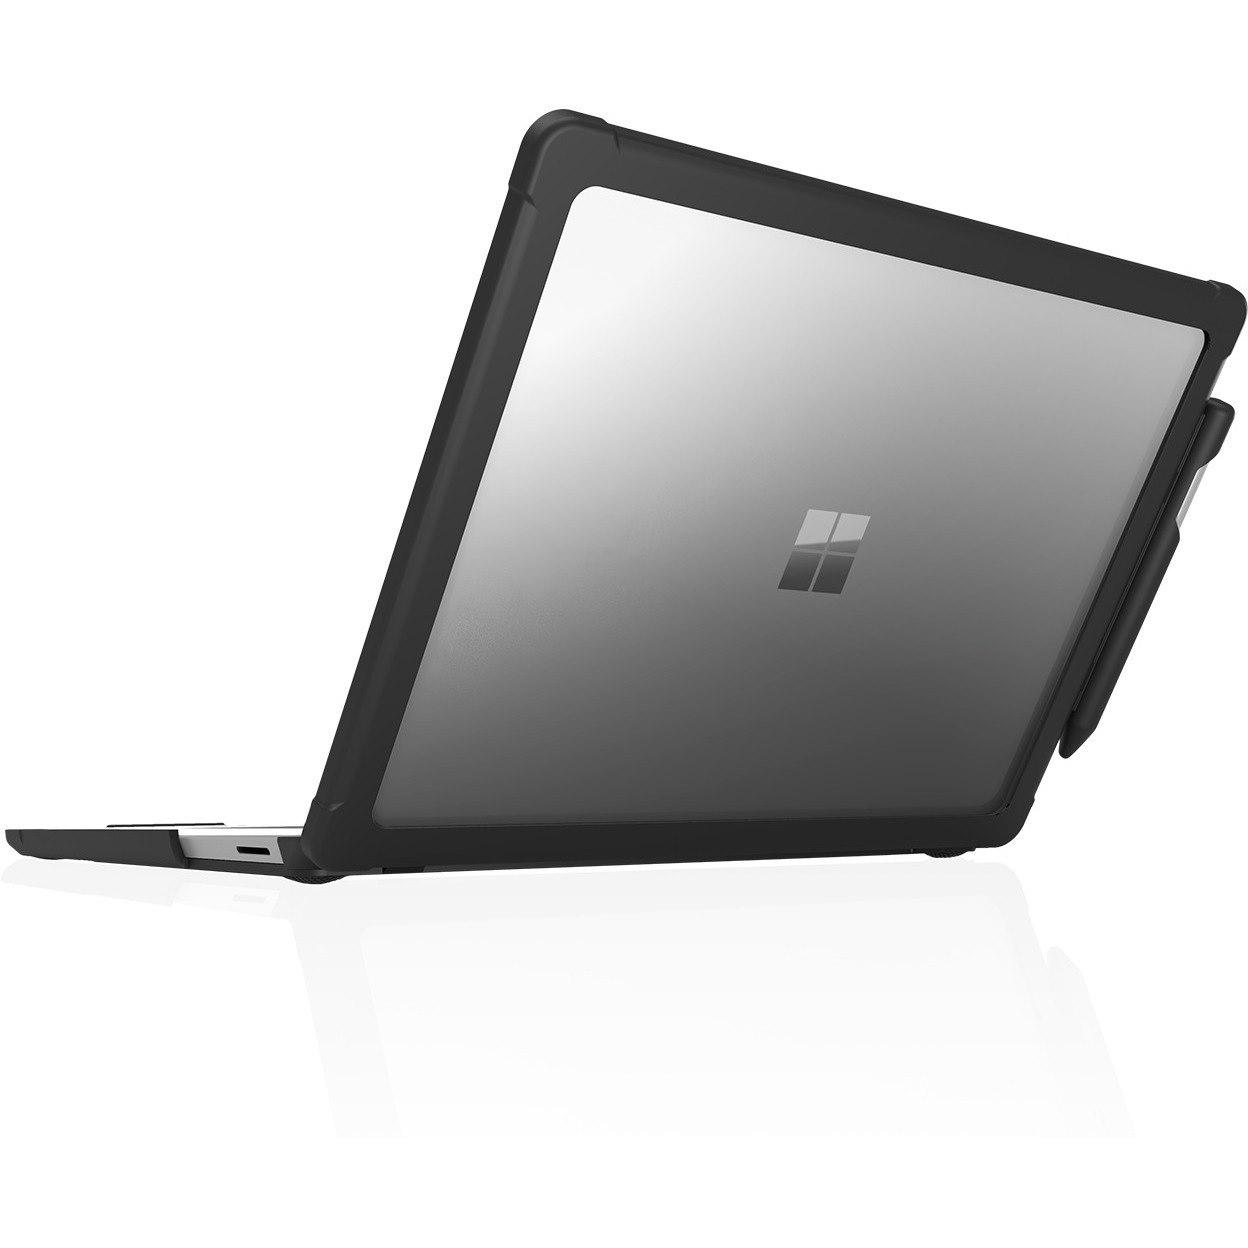 STM Goods Dux Case for Microsoft Notebook, Stylus - Transparent, Black